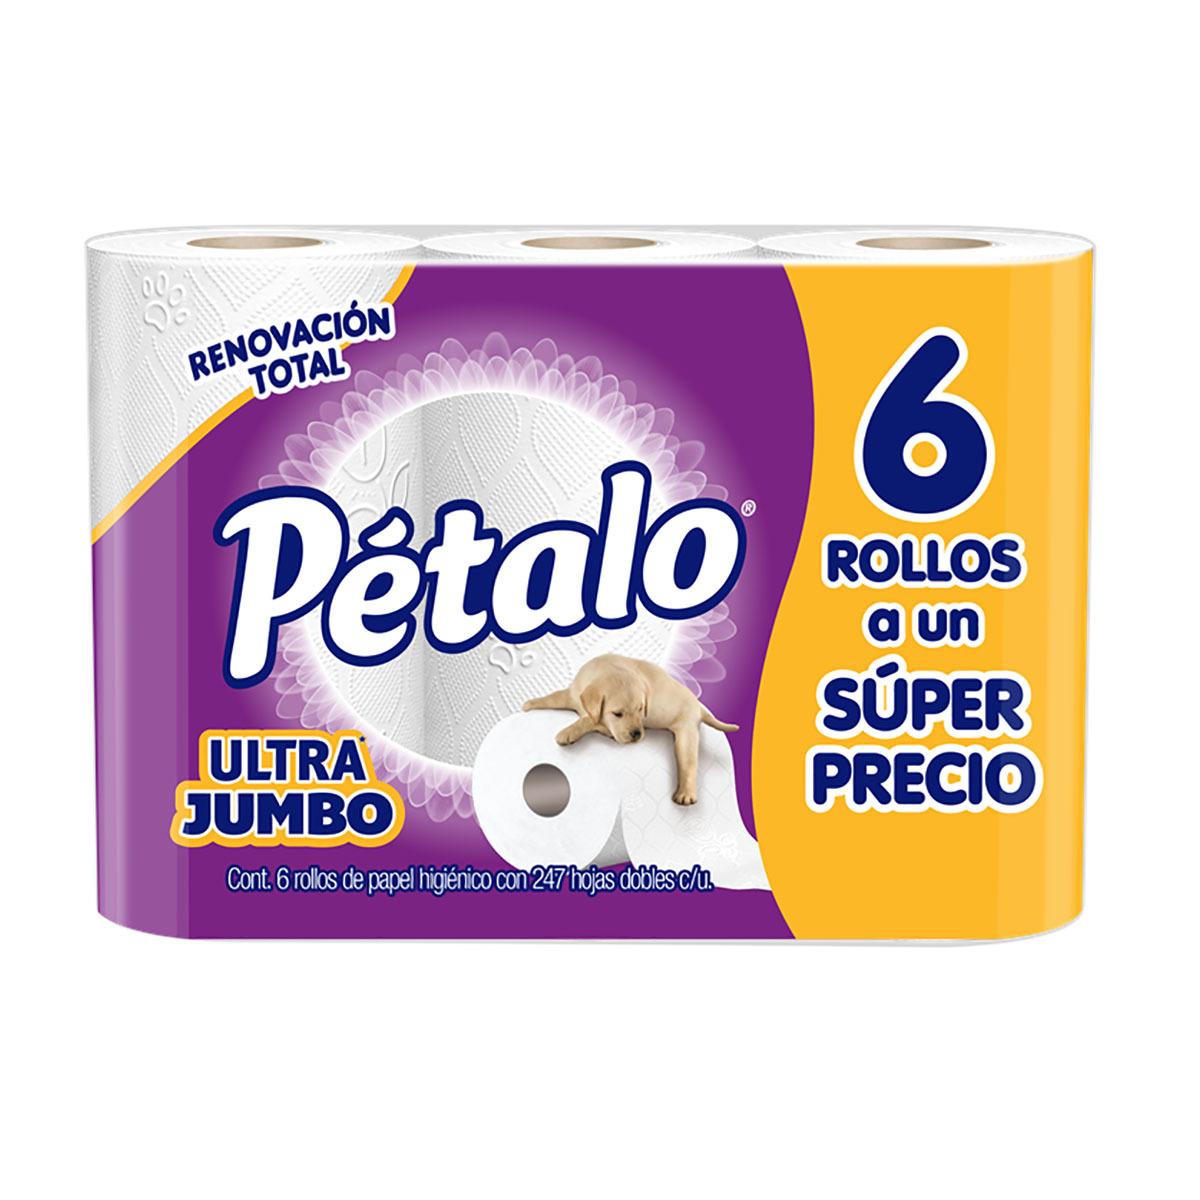 1e4094d648f3b Chedraui en línea  Papel higiénico Petalo Ultra Jumbo de 6 rollos